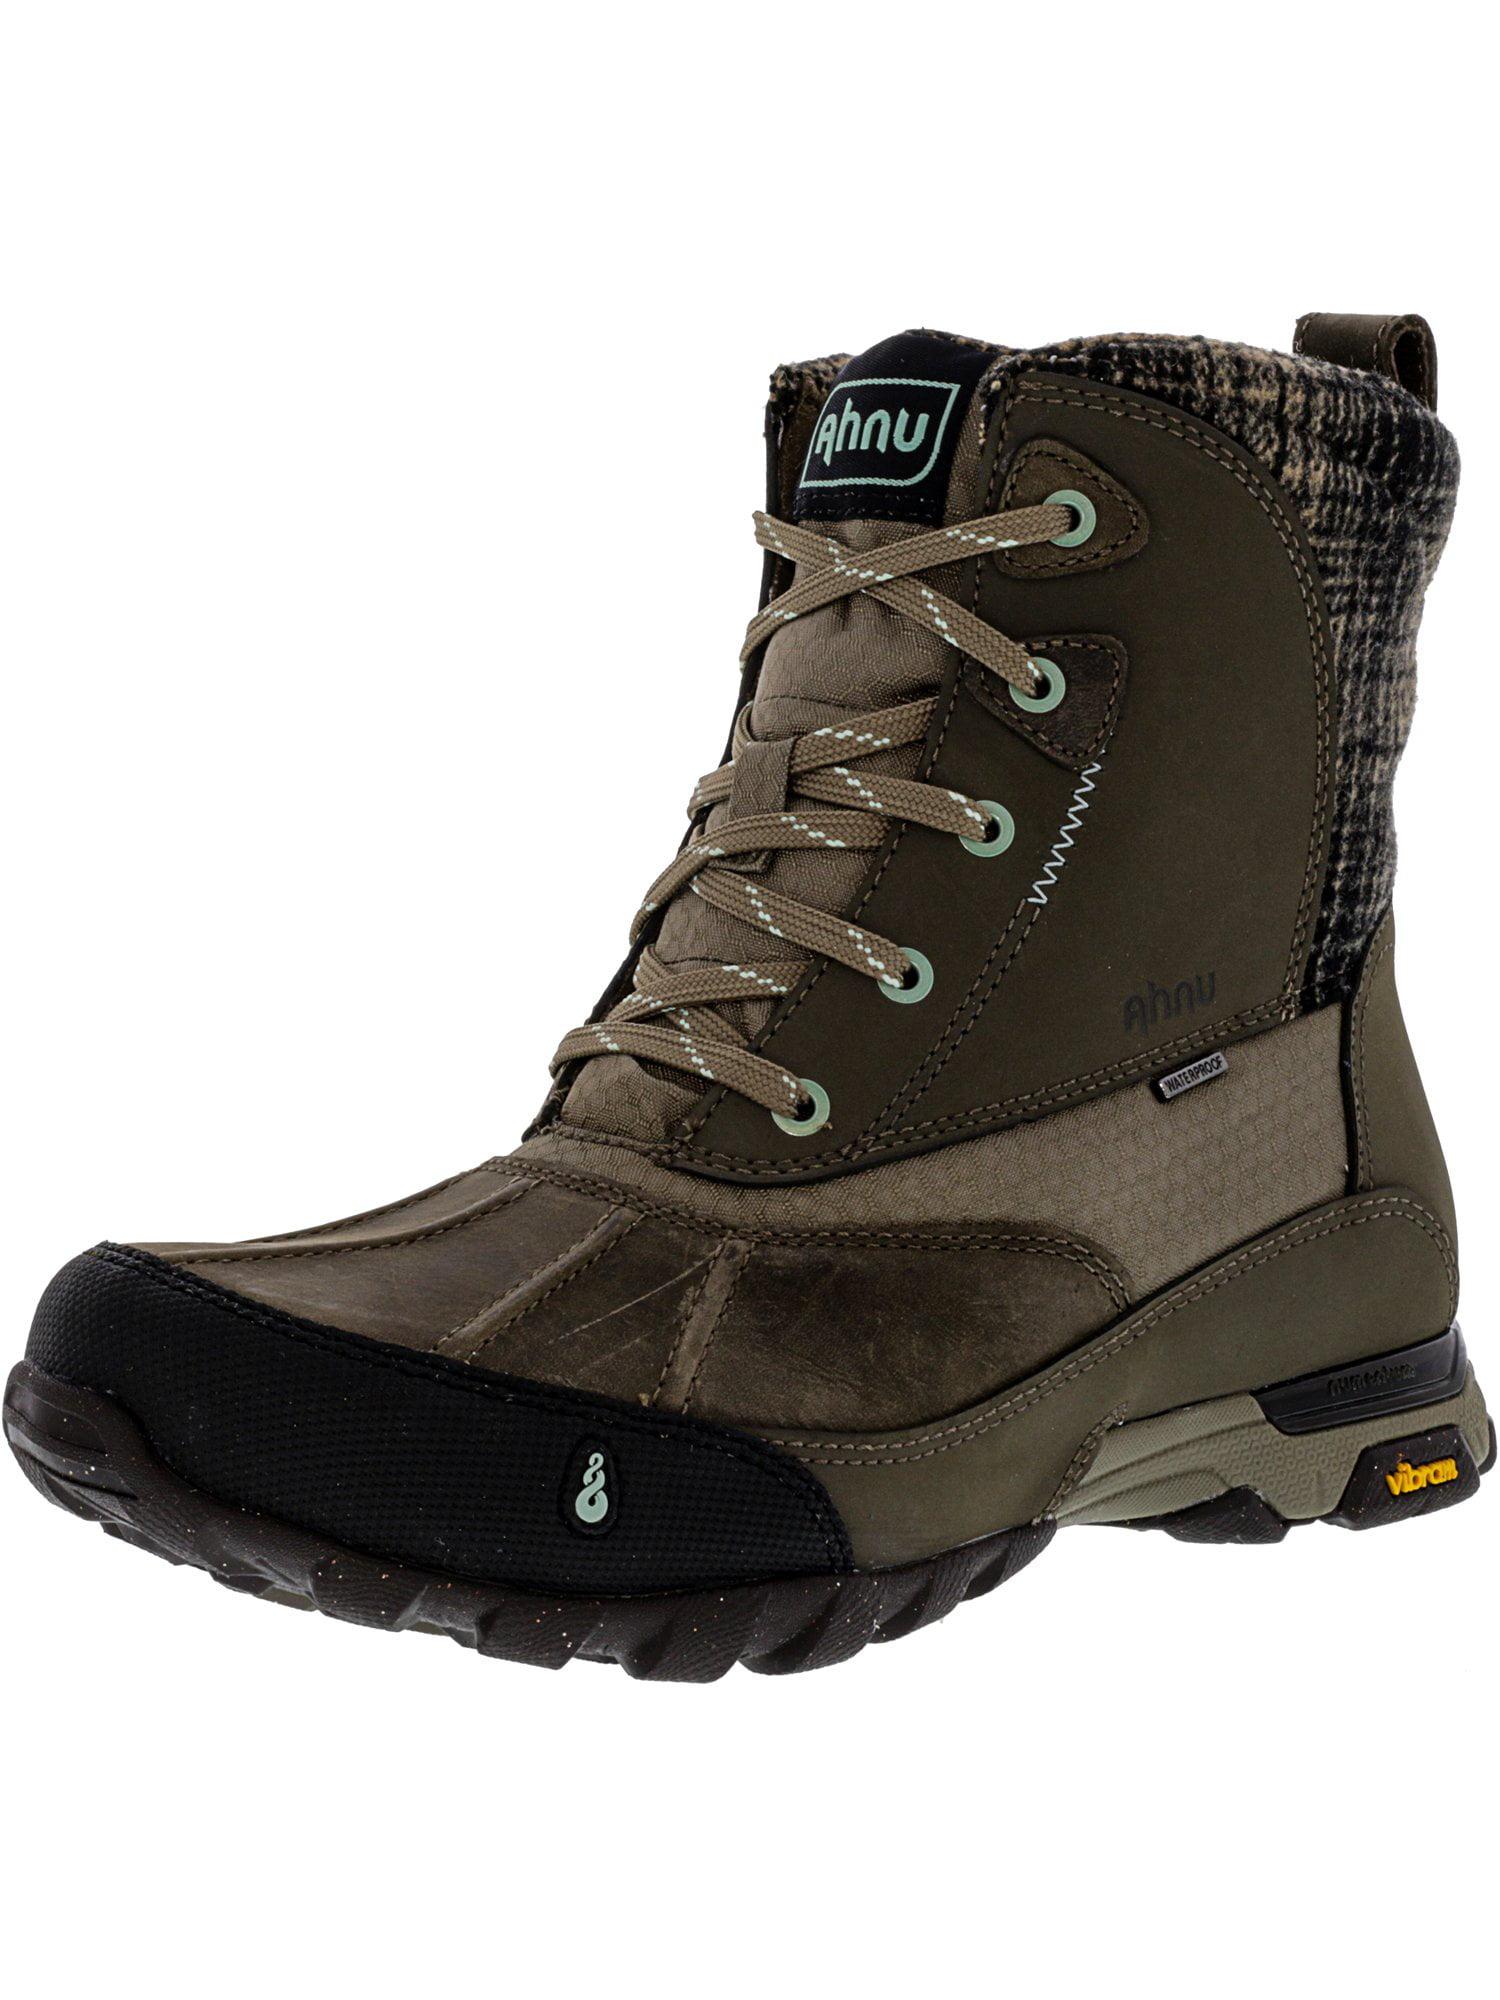 16eeeae84bf Ahnu Women's Sugar Peak Insulated Waterproof Alder Bark Mid-Calf Leather  Hiking Boot - 7.5M